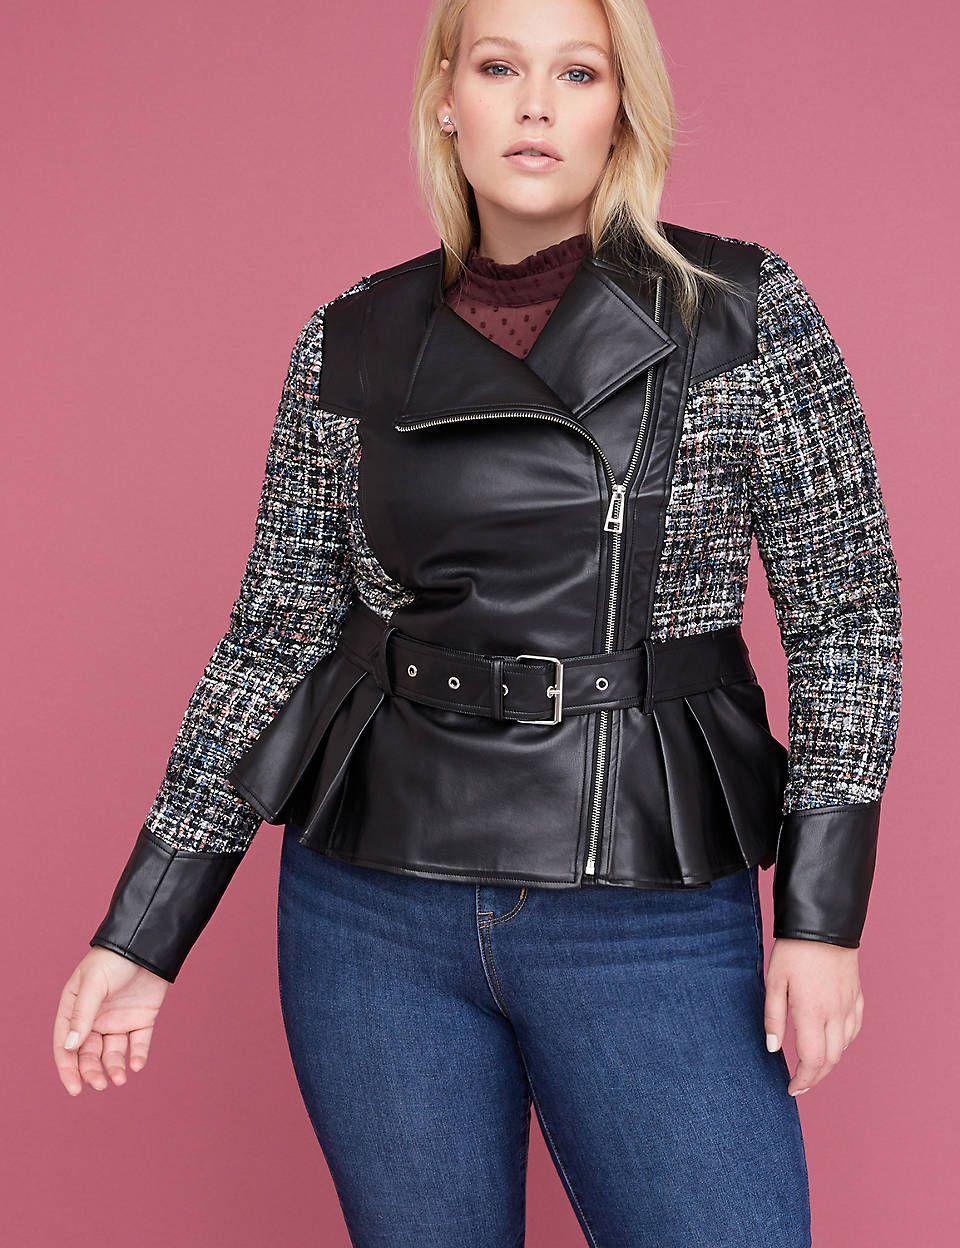 Tweed Faux Leather Peplum Jacket Peplum Jacket Leather Peplum Plus Size Winter Jackets [ 1248 x 960 Pixel ]